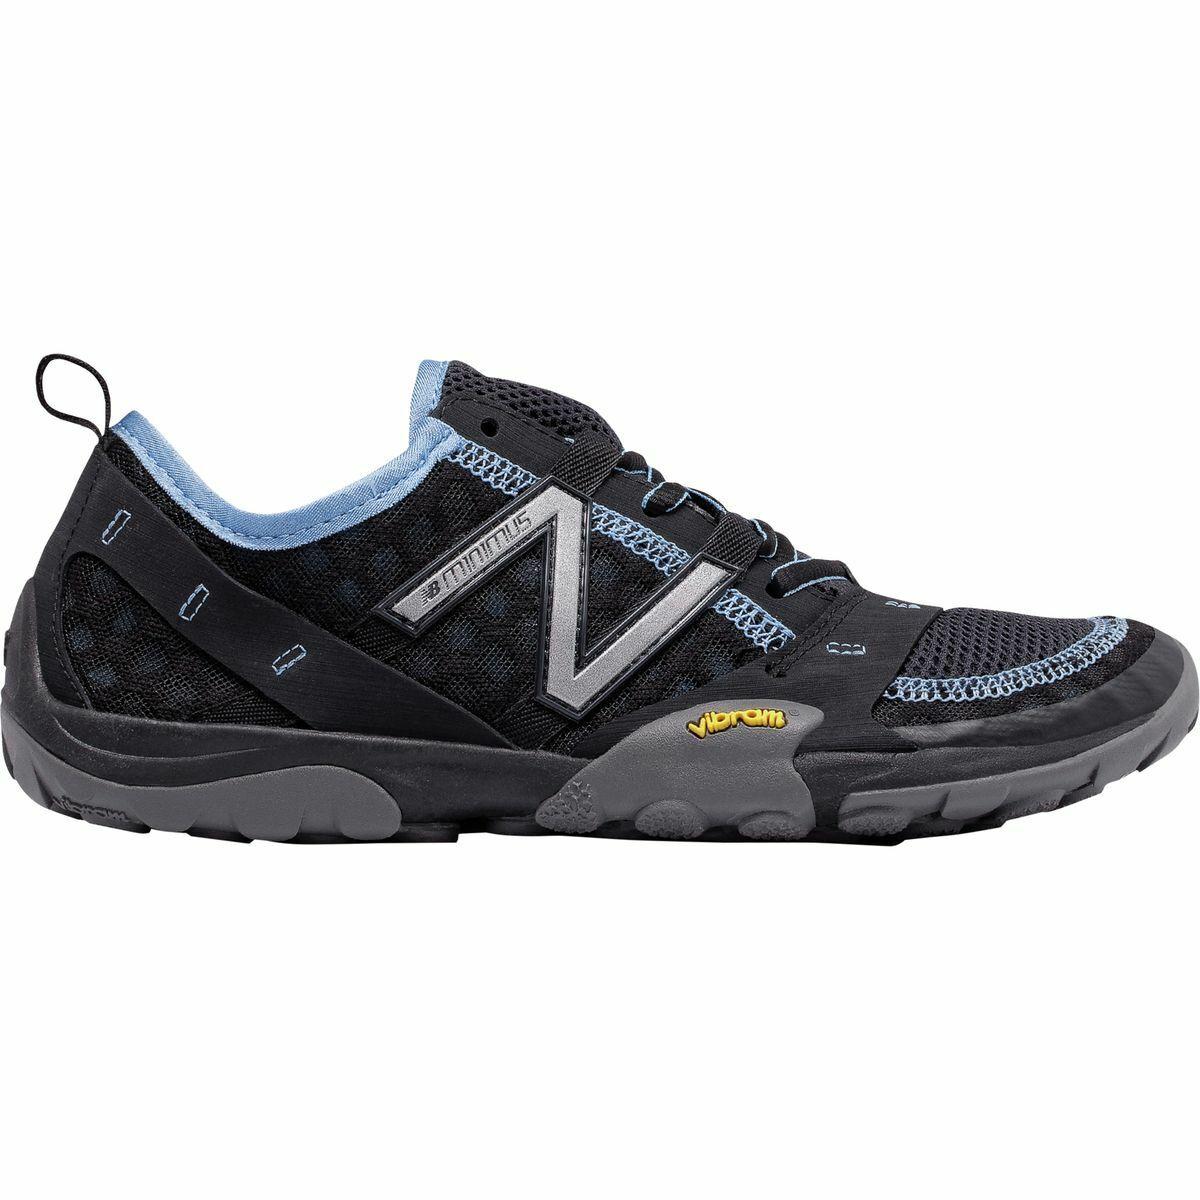 New Balance Minimus Running Zapatos para mujer 7.5 8 8.5 Minimalista Trail WT10BB Negro